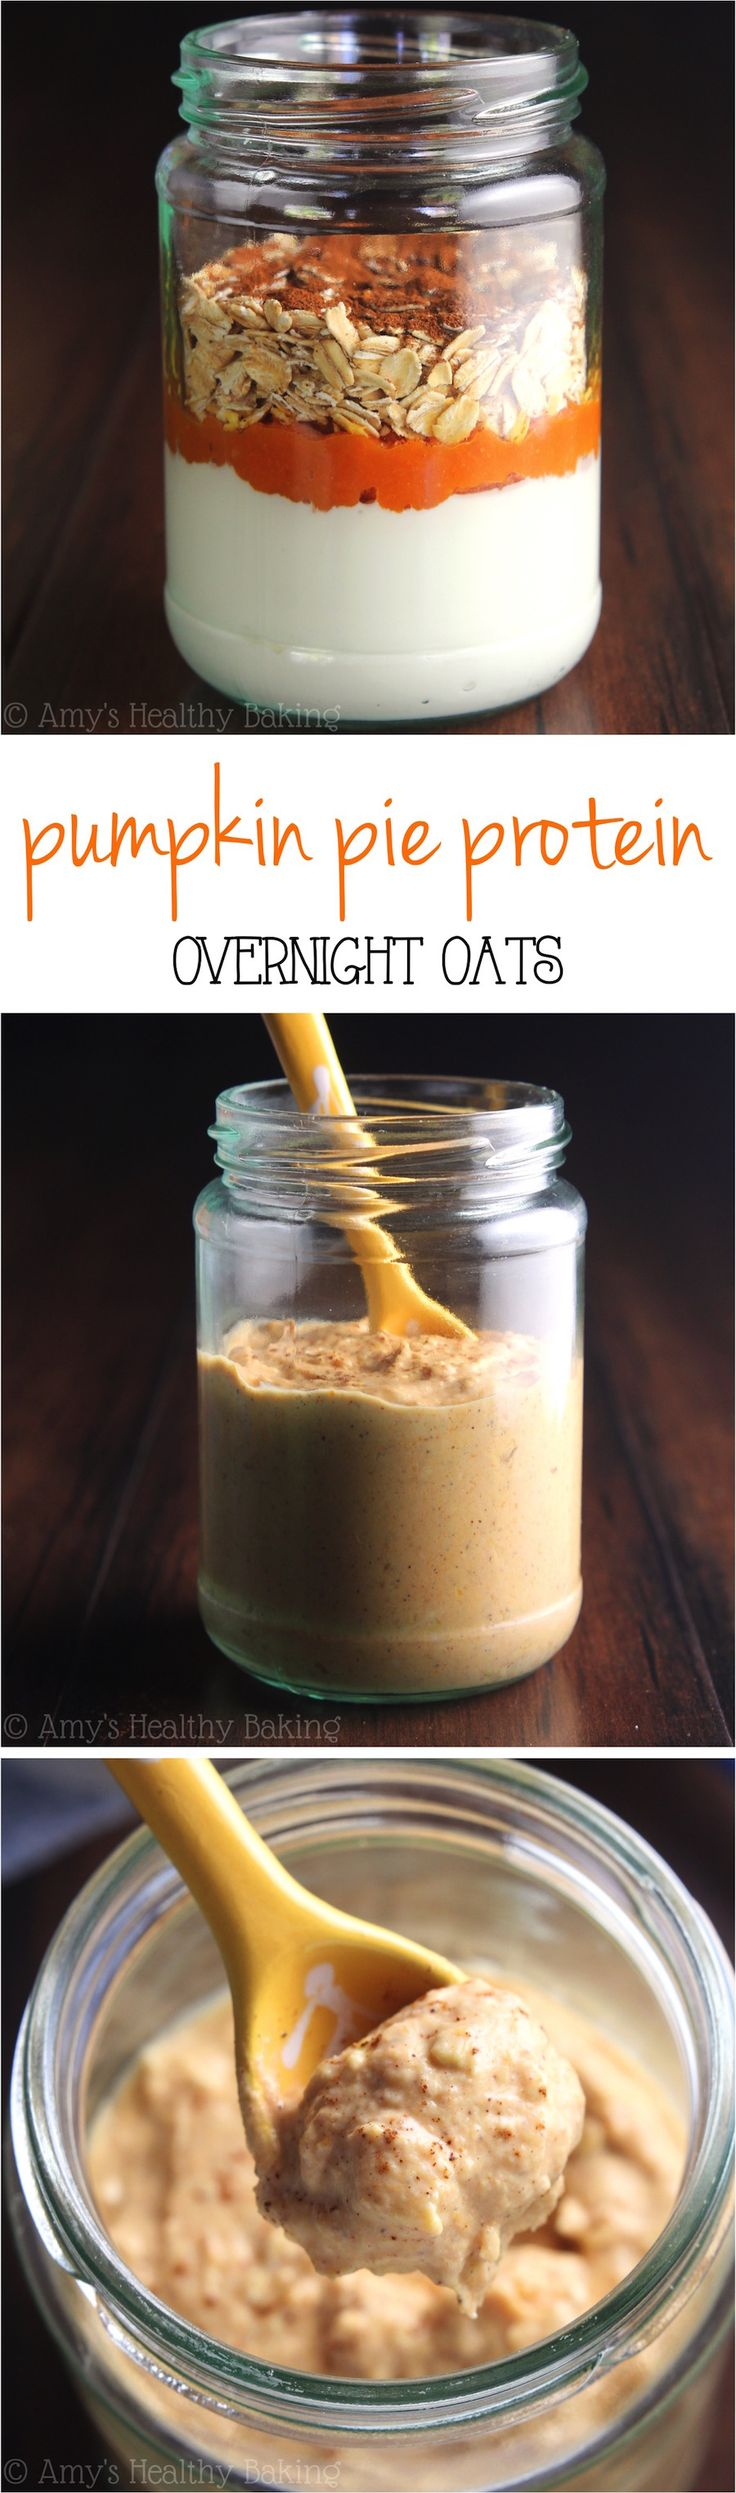 Pumpkin Pie Protein Overnight Oats -- just 5 healthy ingredients & 16g of protein!